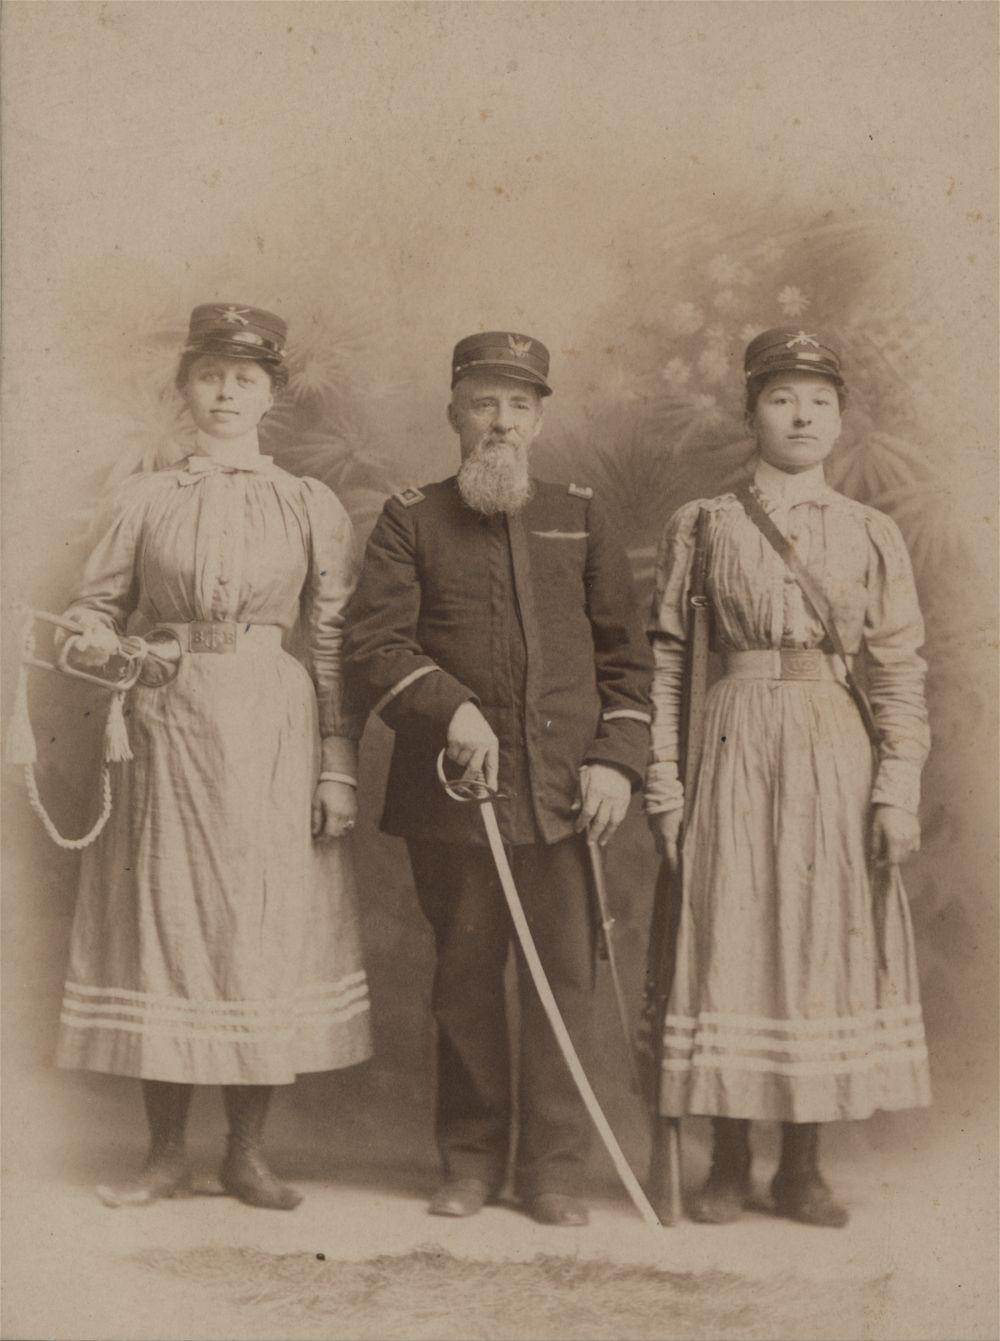 Boyd's Girl Cadets with H. N. Boyd, Topeka, Kansas